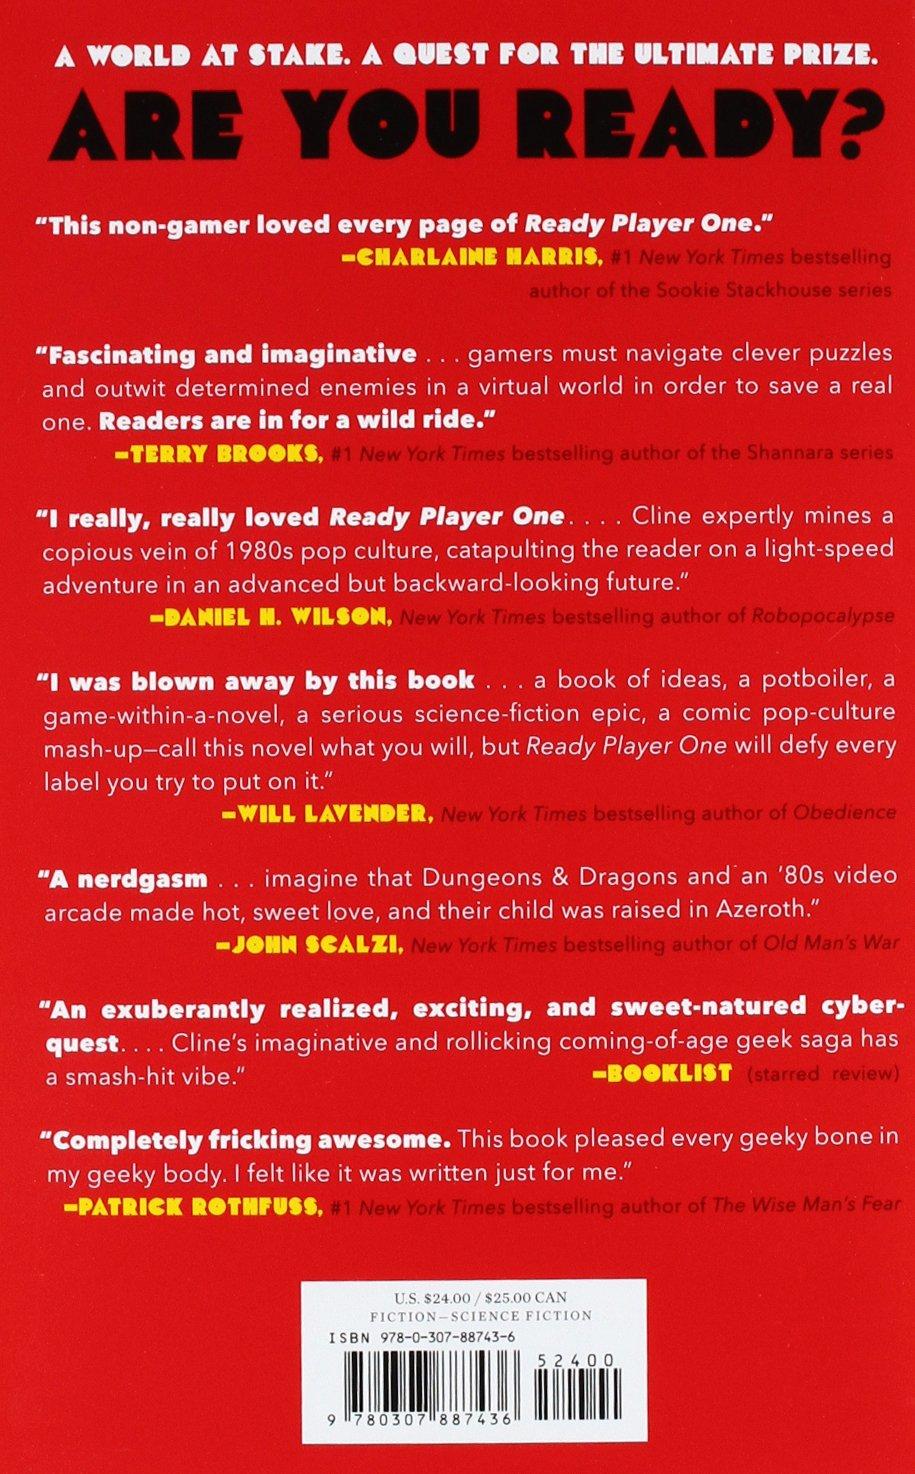 Ready Player One [Idioma Inglés]: Amazon.es: Cline, Ernest: Libros ...